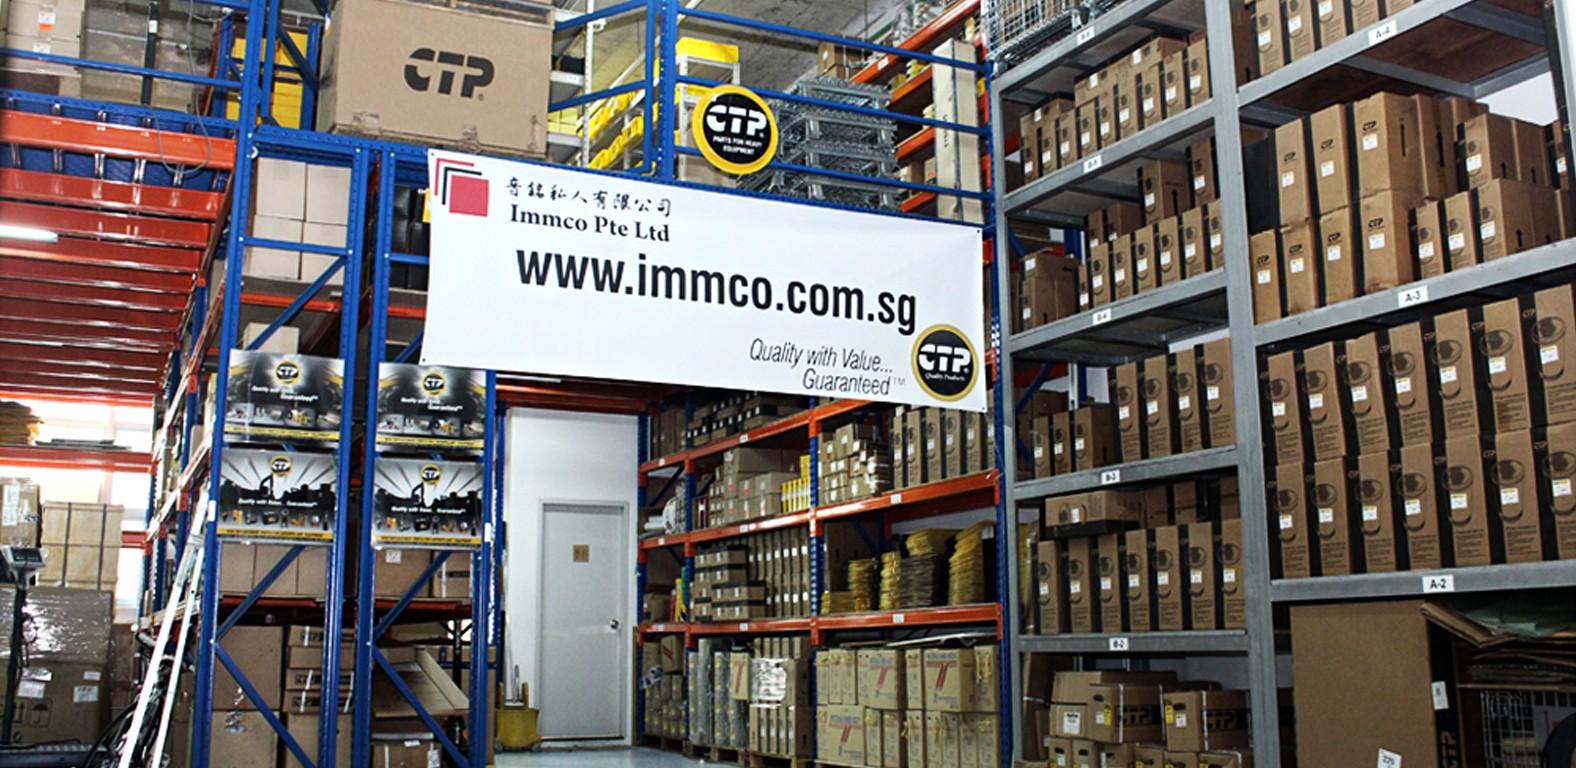 Immco Pte Ltd   LinkedIn